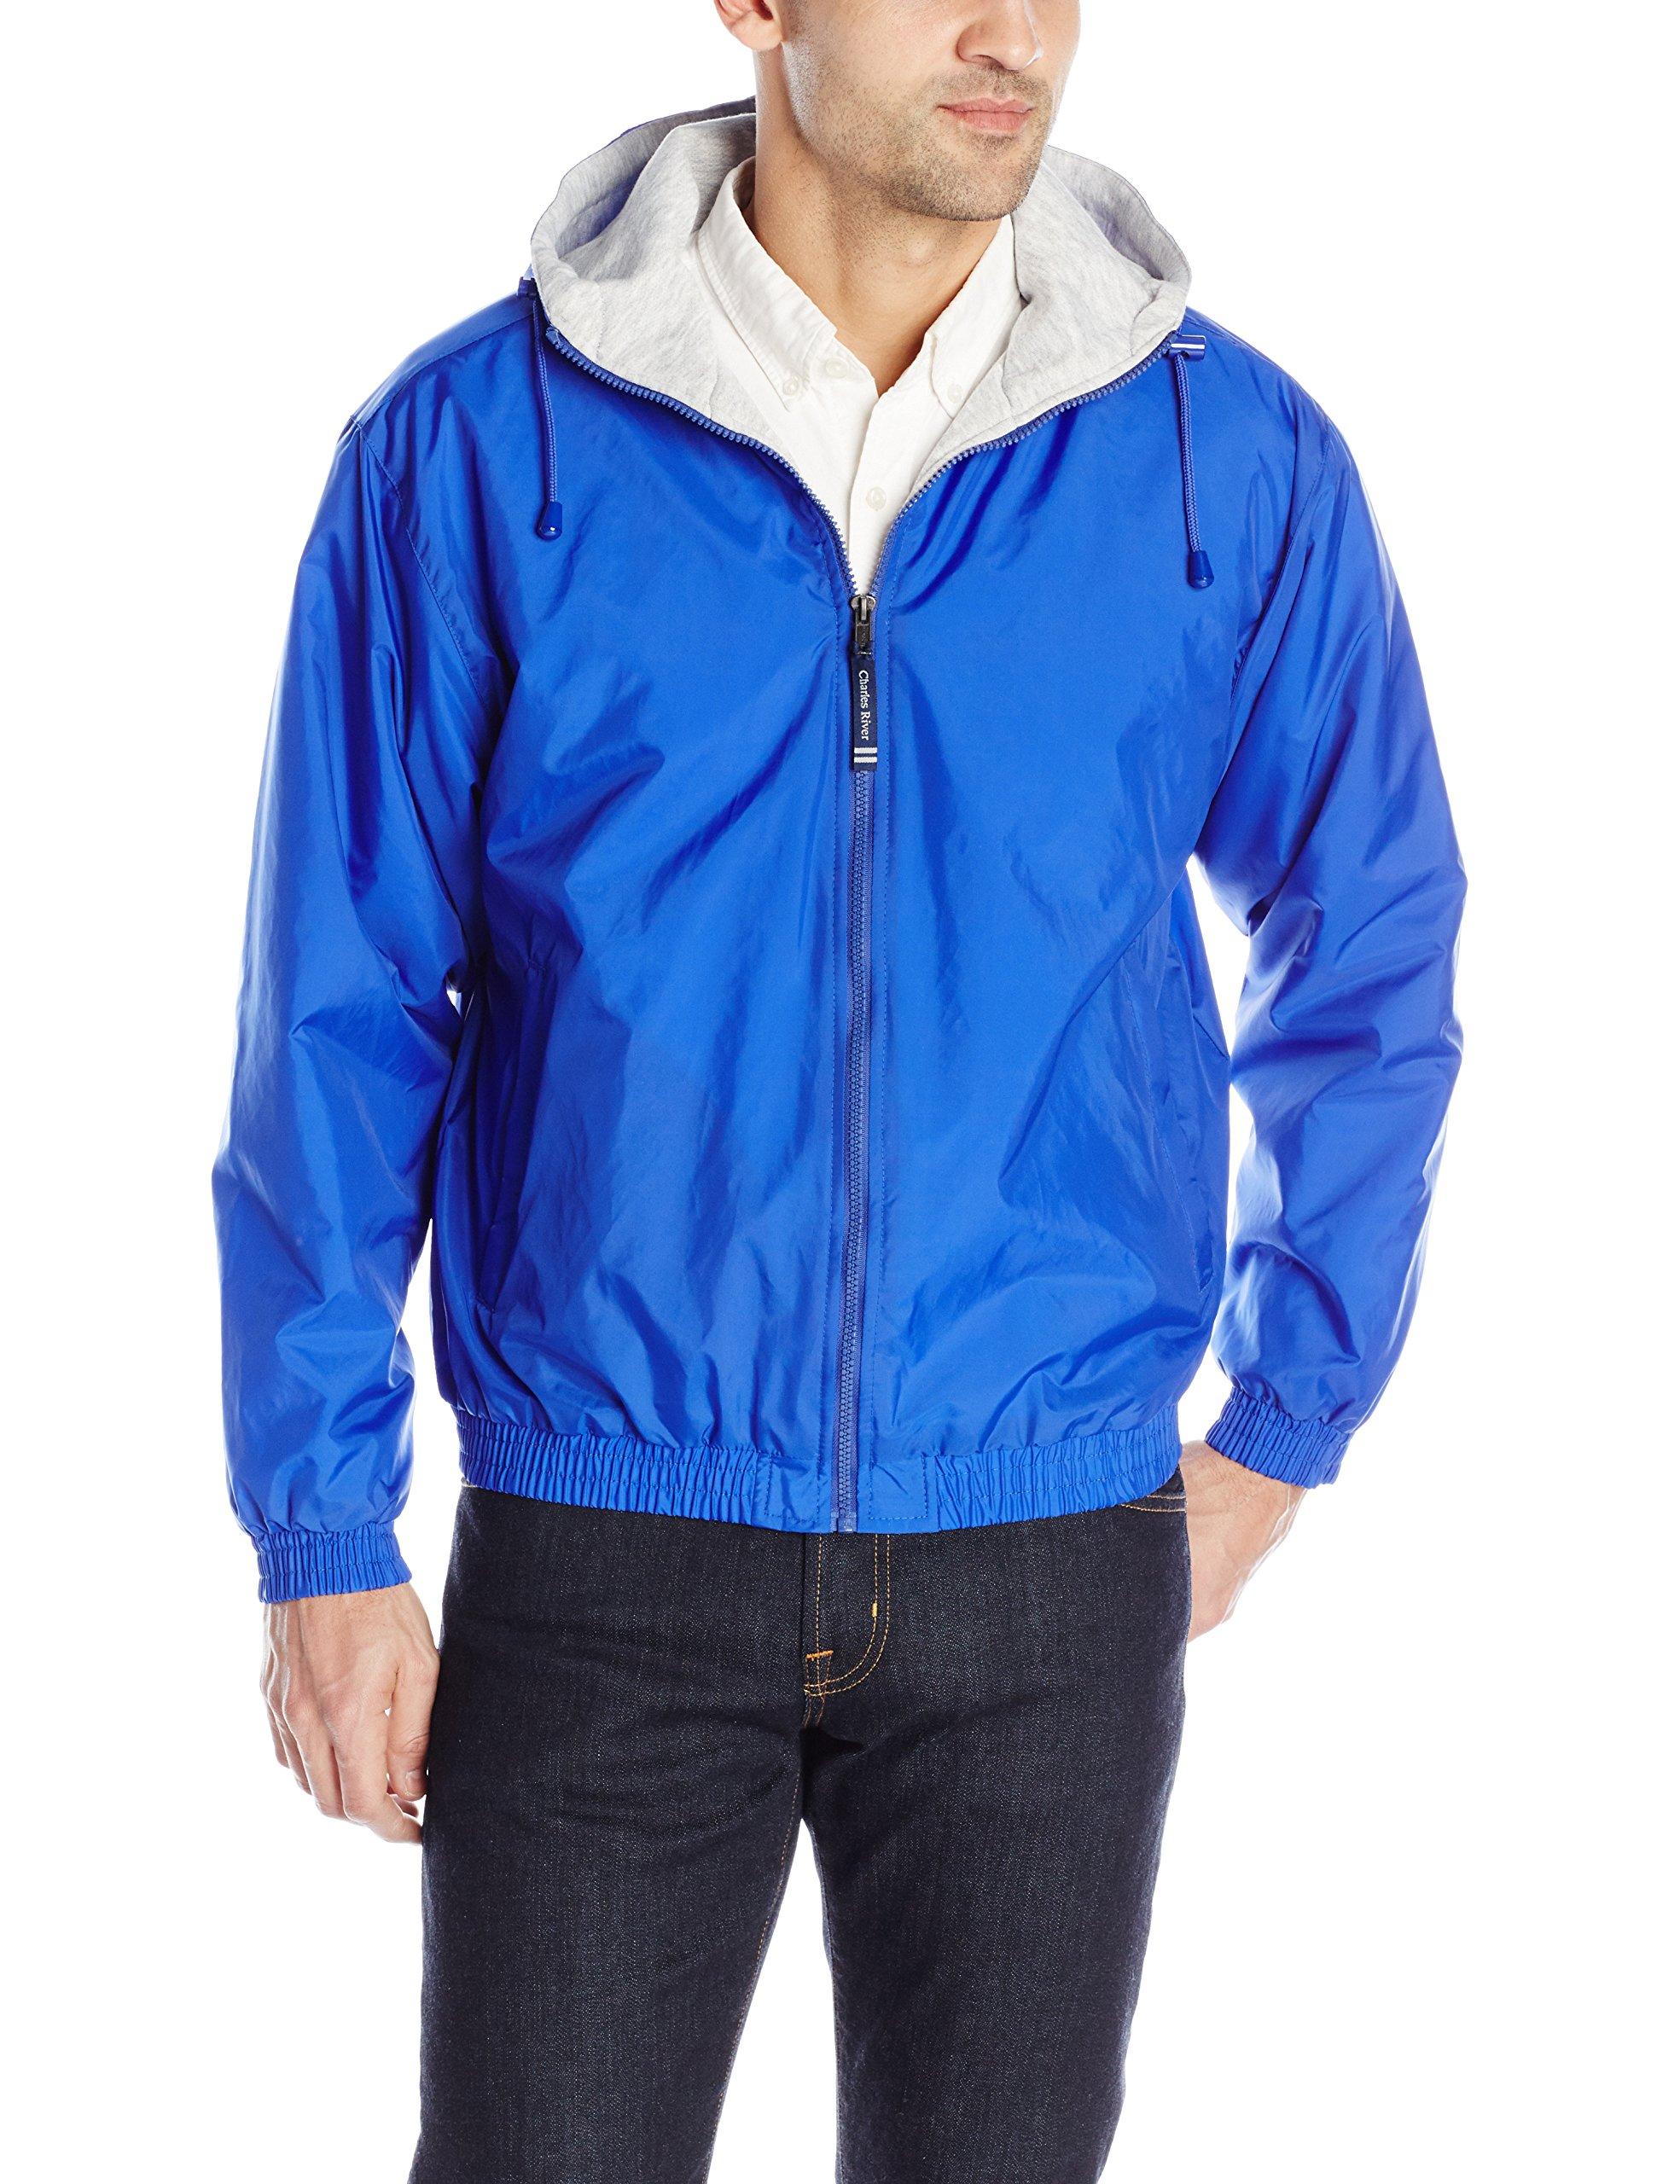 Charles River Apparel Men's Performer Jacket, Royal, XXX-Large